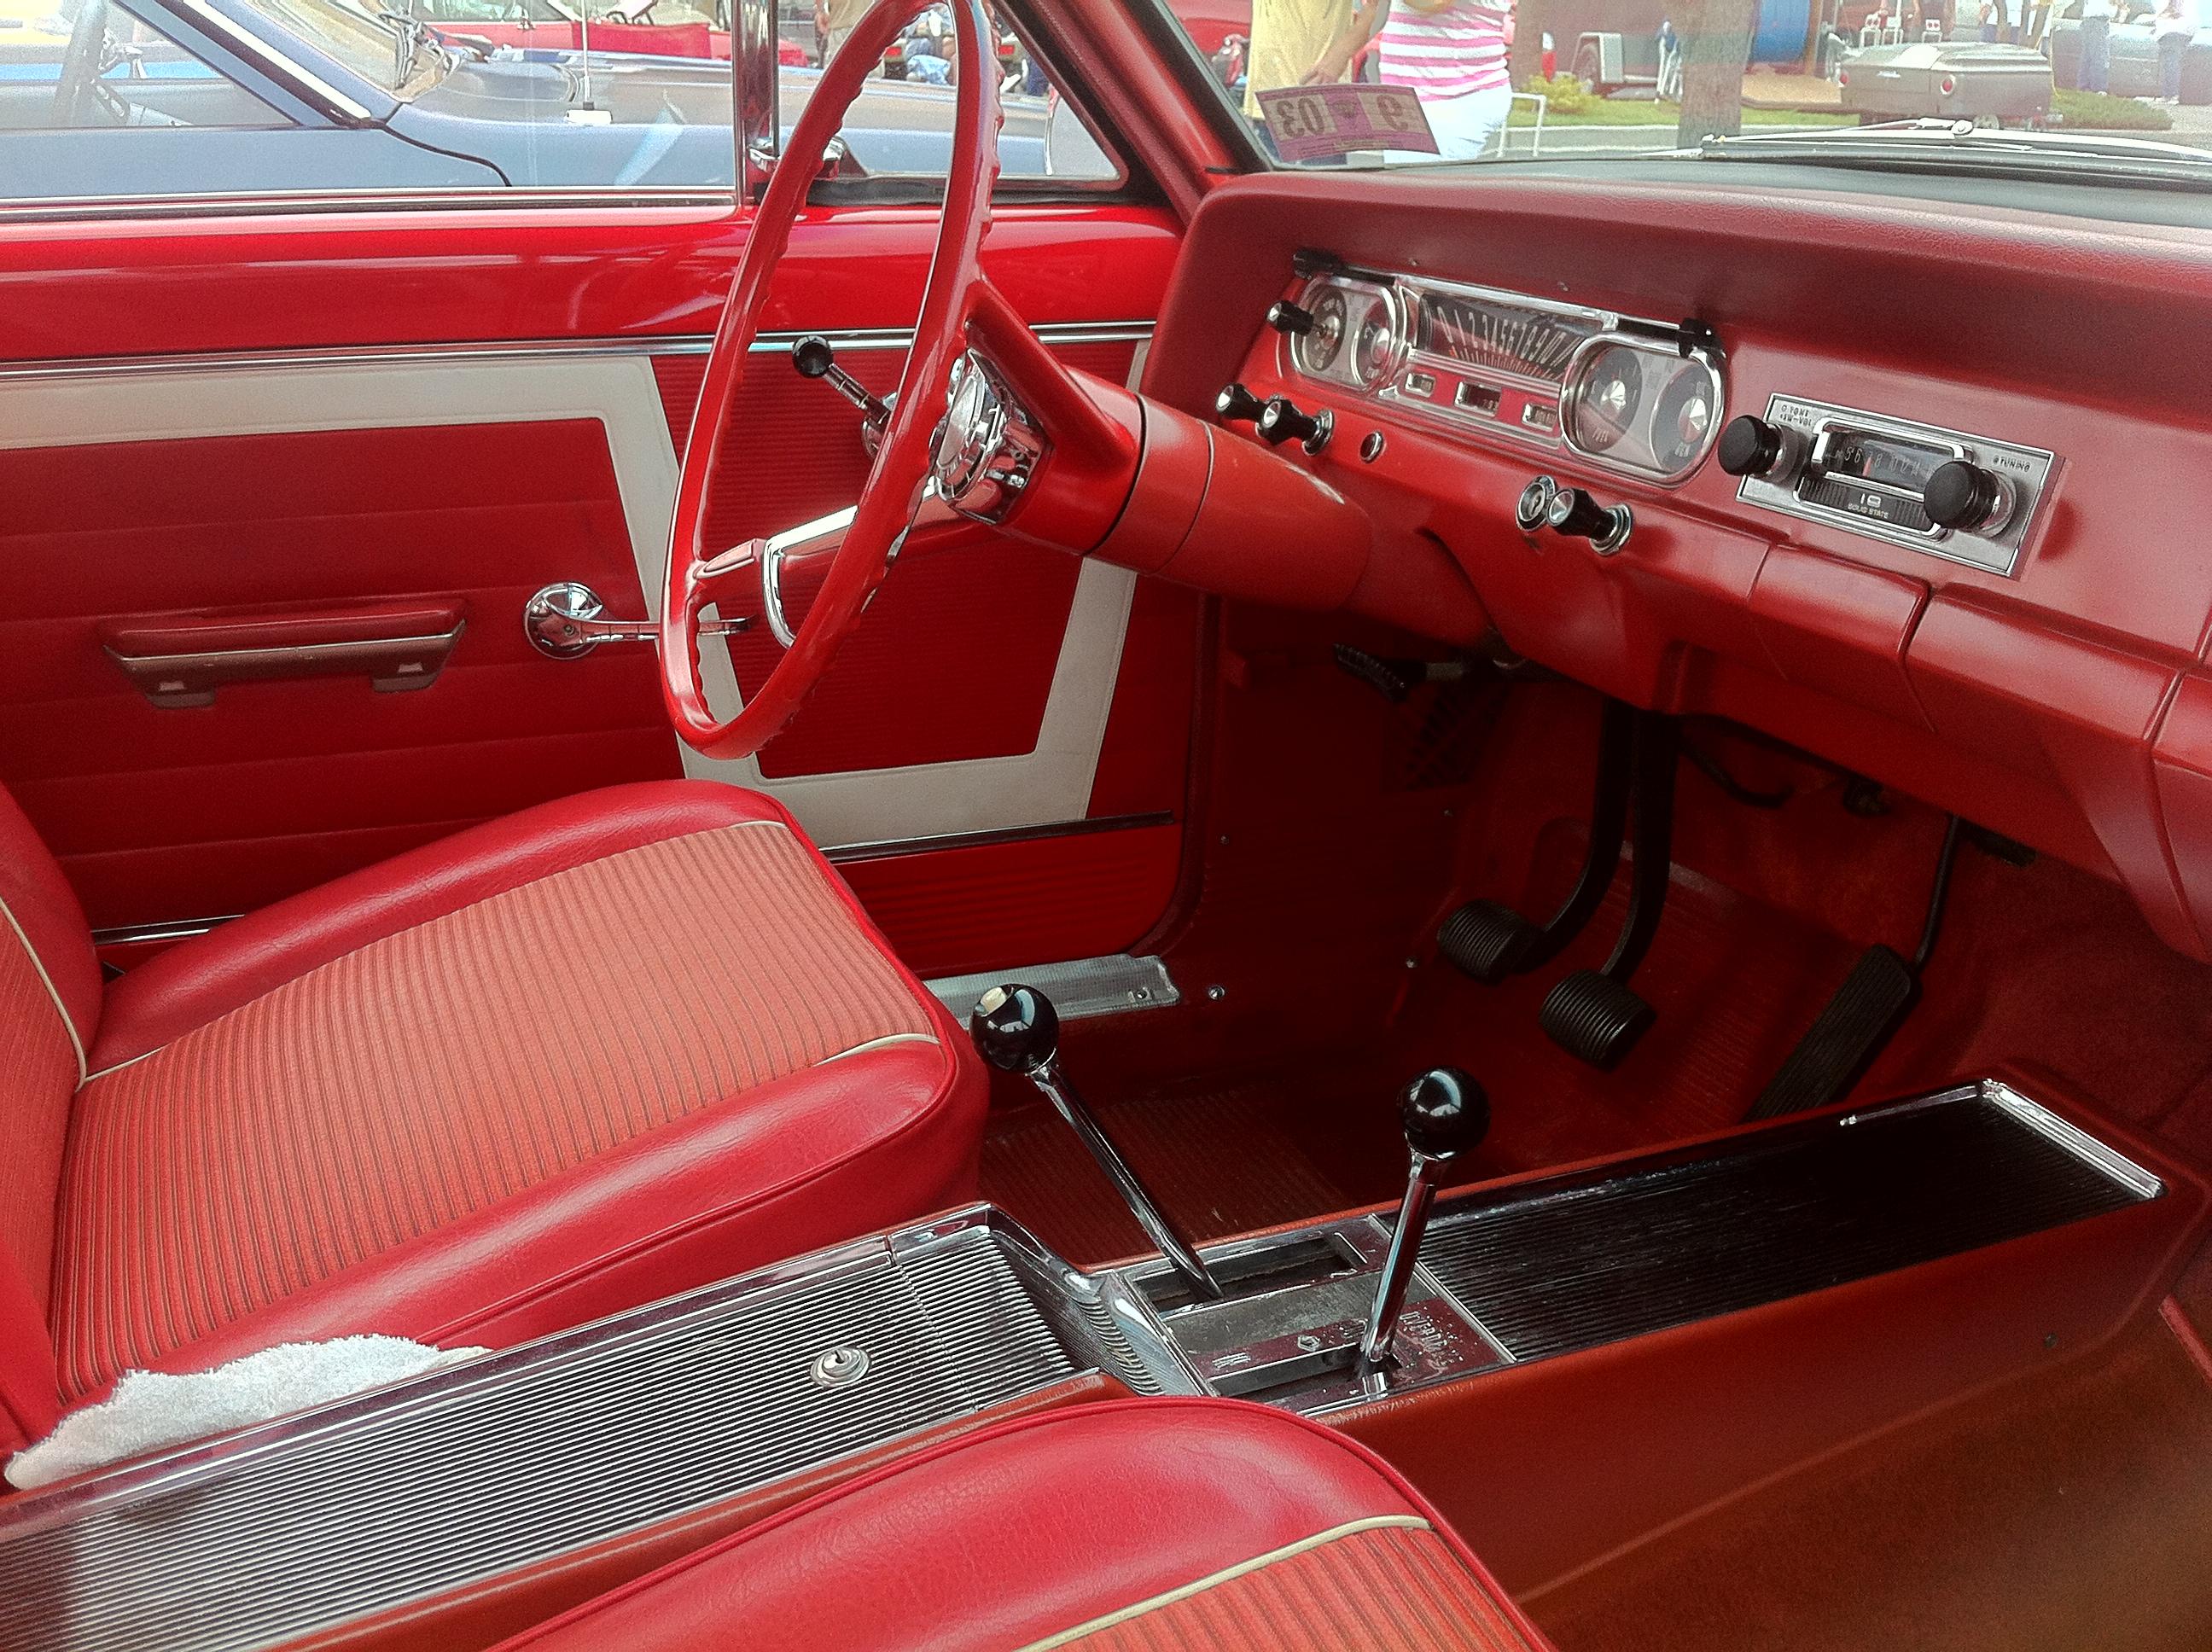 American Auto Parts >> File:1964 Rambler American 440-H hardtop 2014-AMO-NC-d.jpg ...